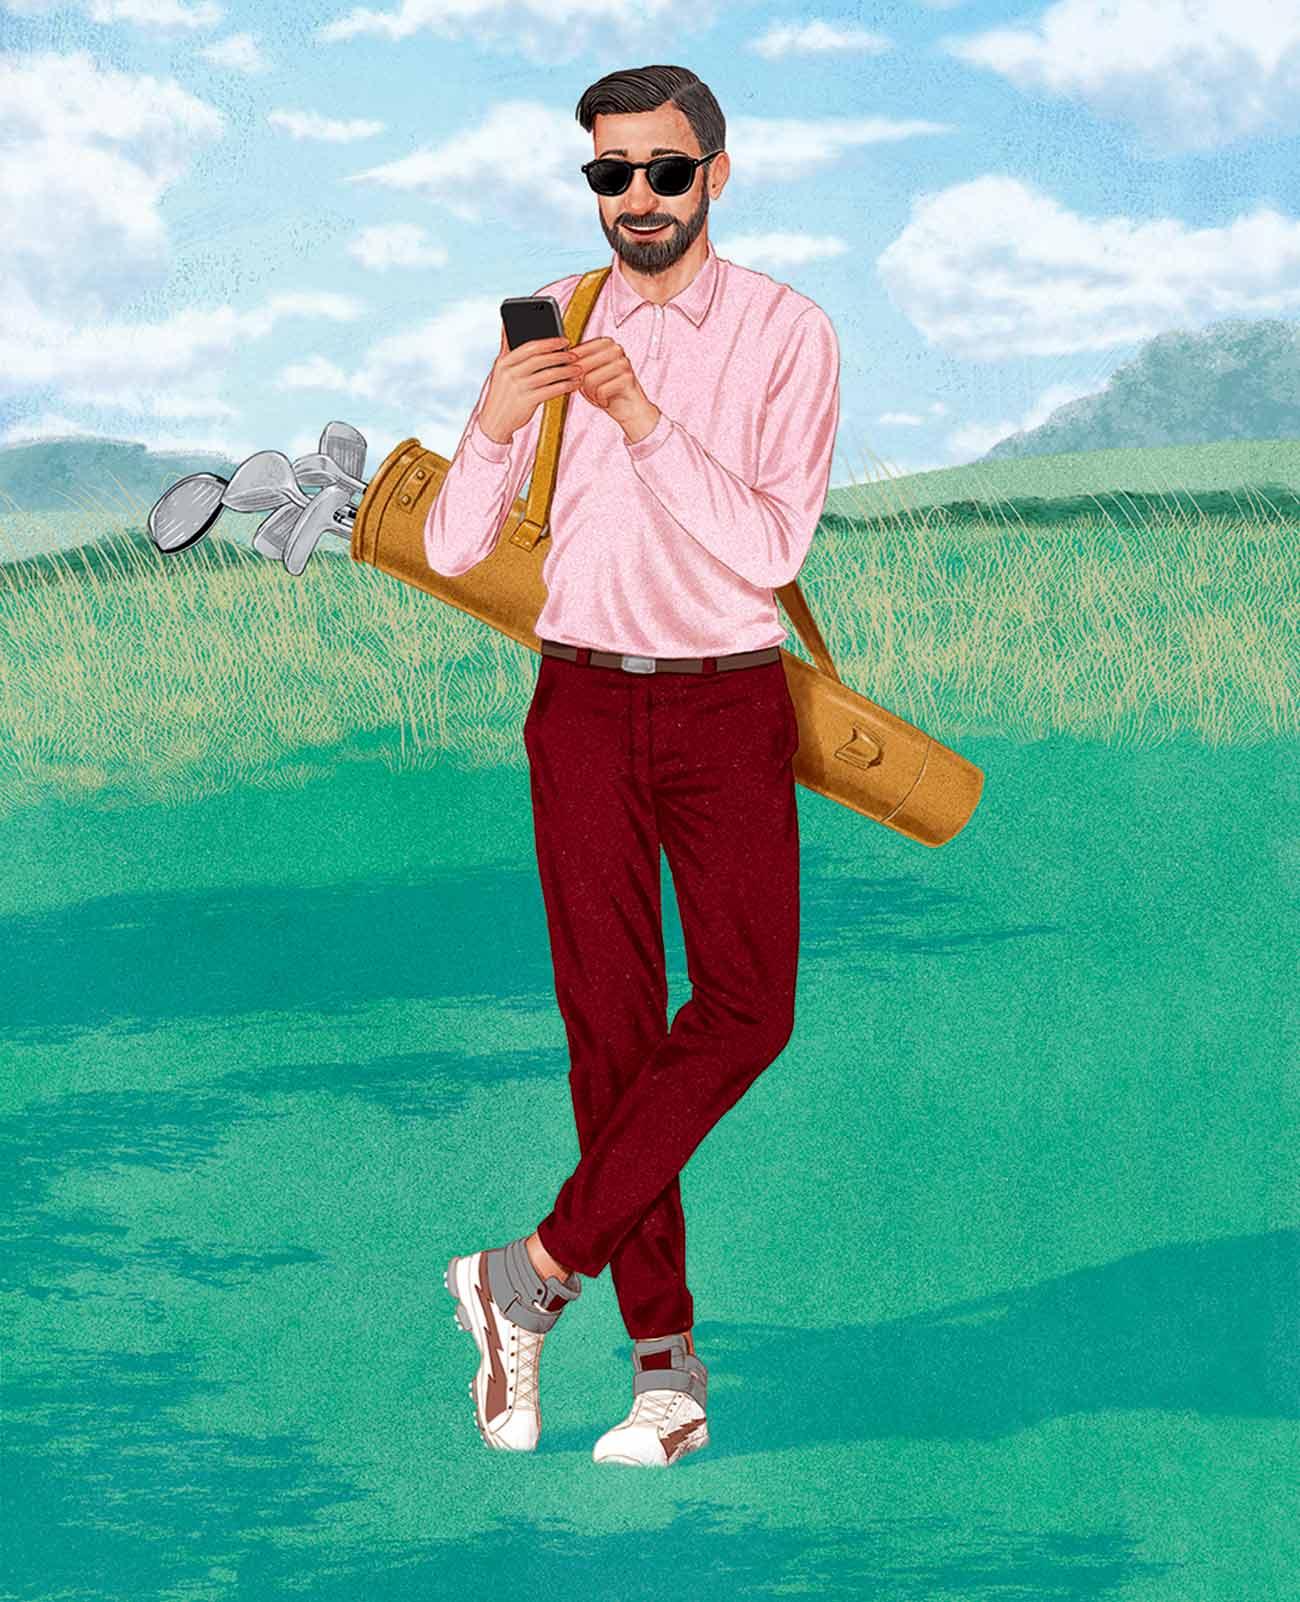 Millennial golfer illustration.